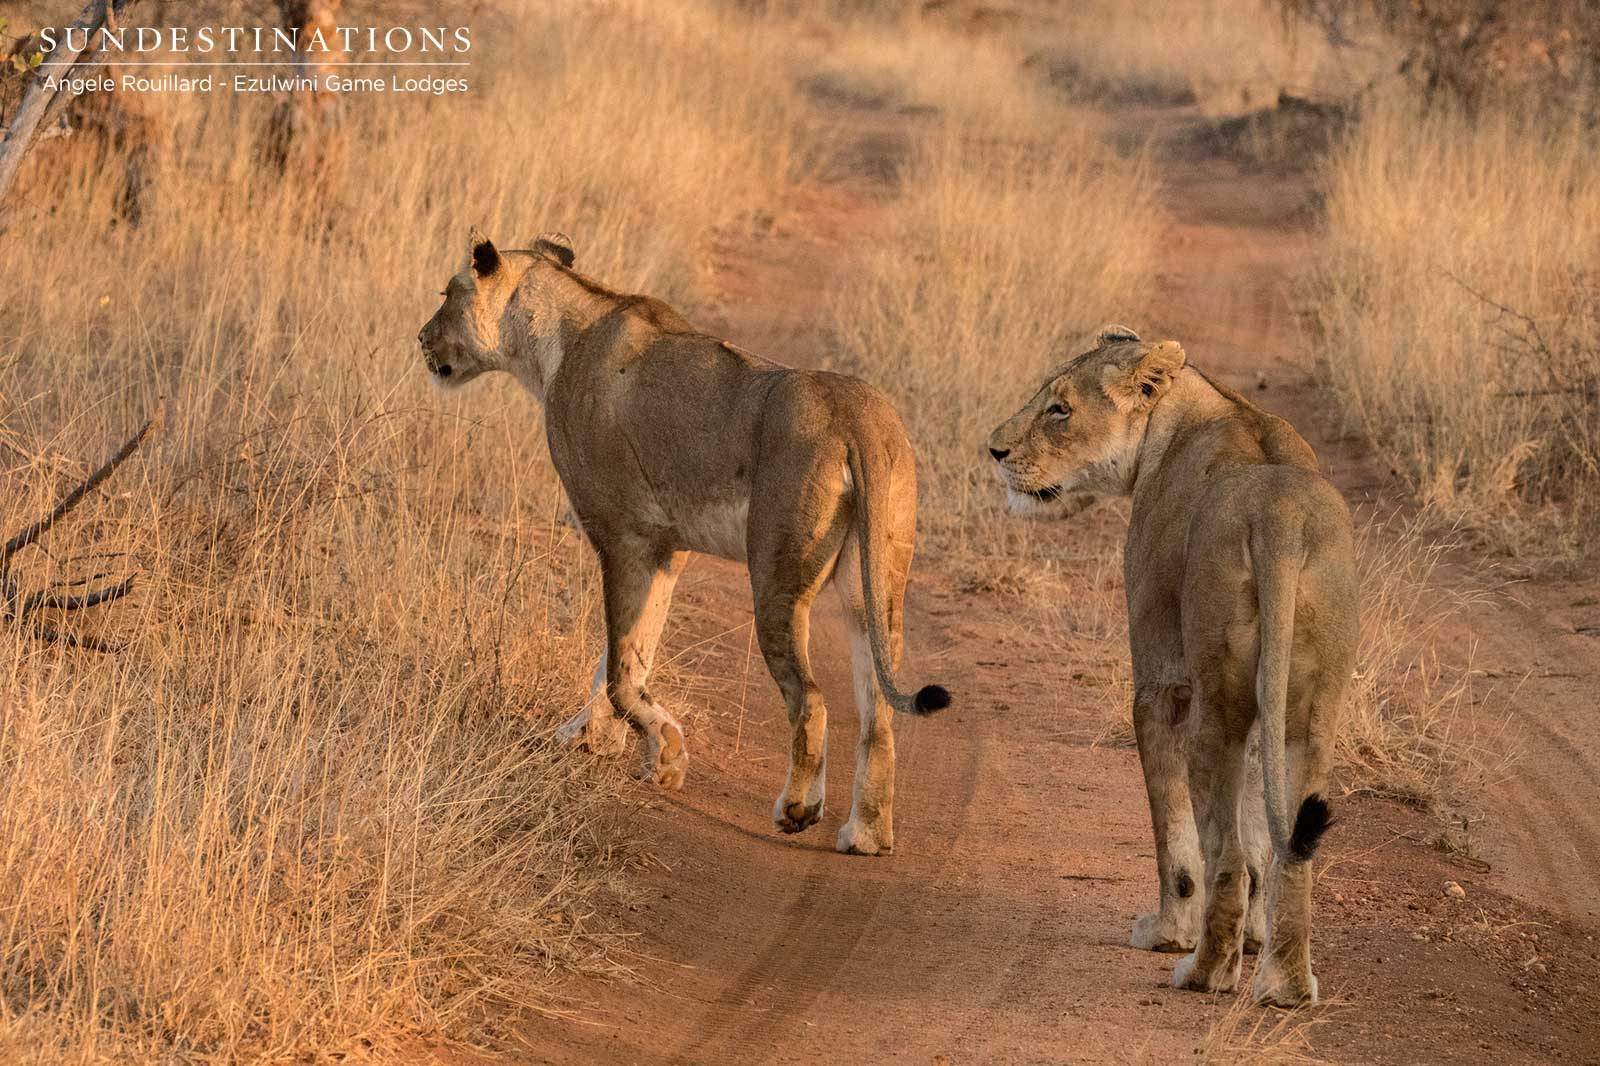 Kudyela Lionesses